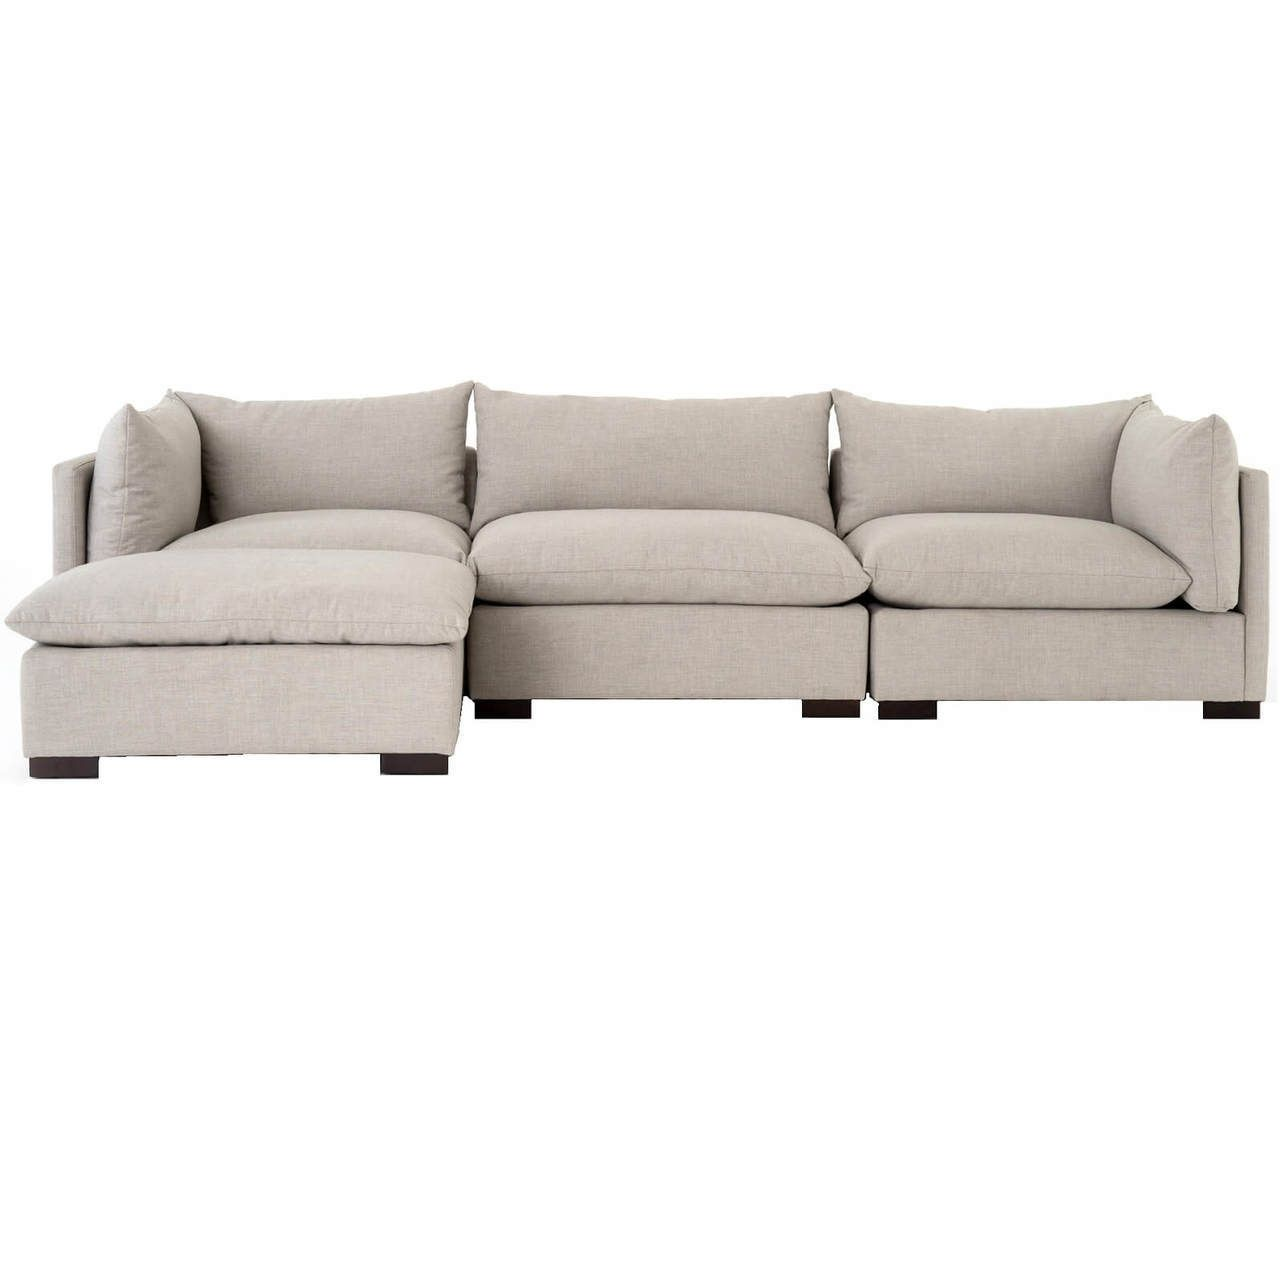 Pleasing Westworld Modern Beige 4 Piece Modular Lounge Sectional Sofa Creativecarmelina Interior Chair Design Creativecarmelinacom